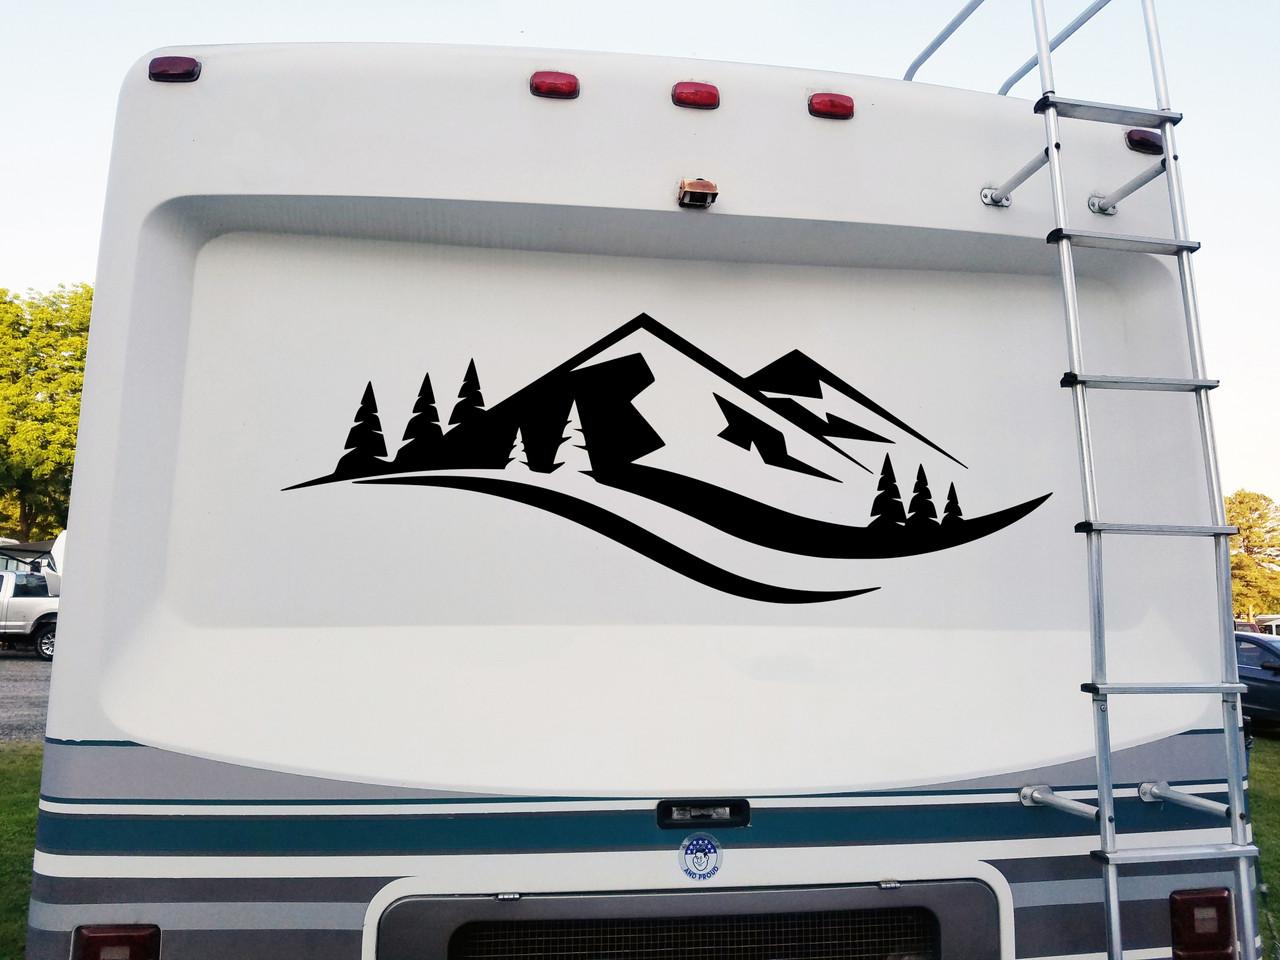 Mountains Forest Scenery V12 - Camper RV Graphics Scene - Die Cut Sticker